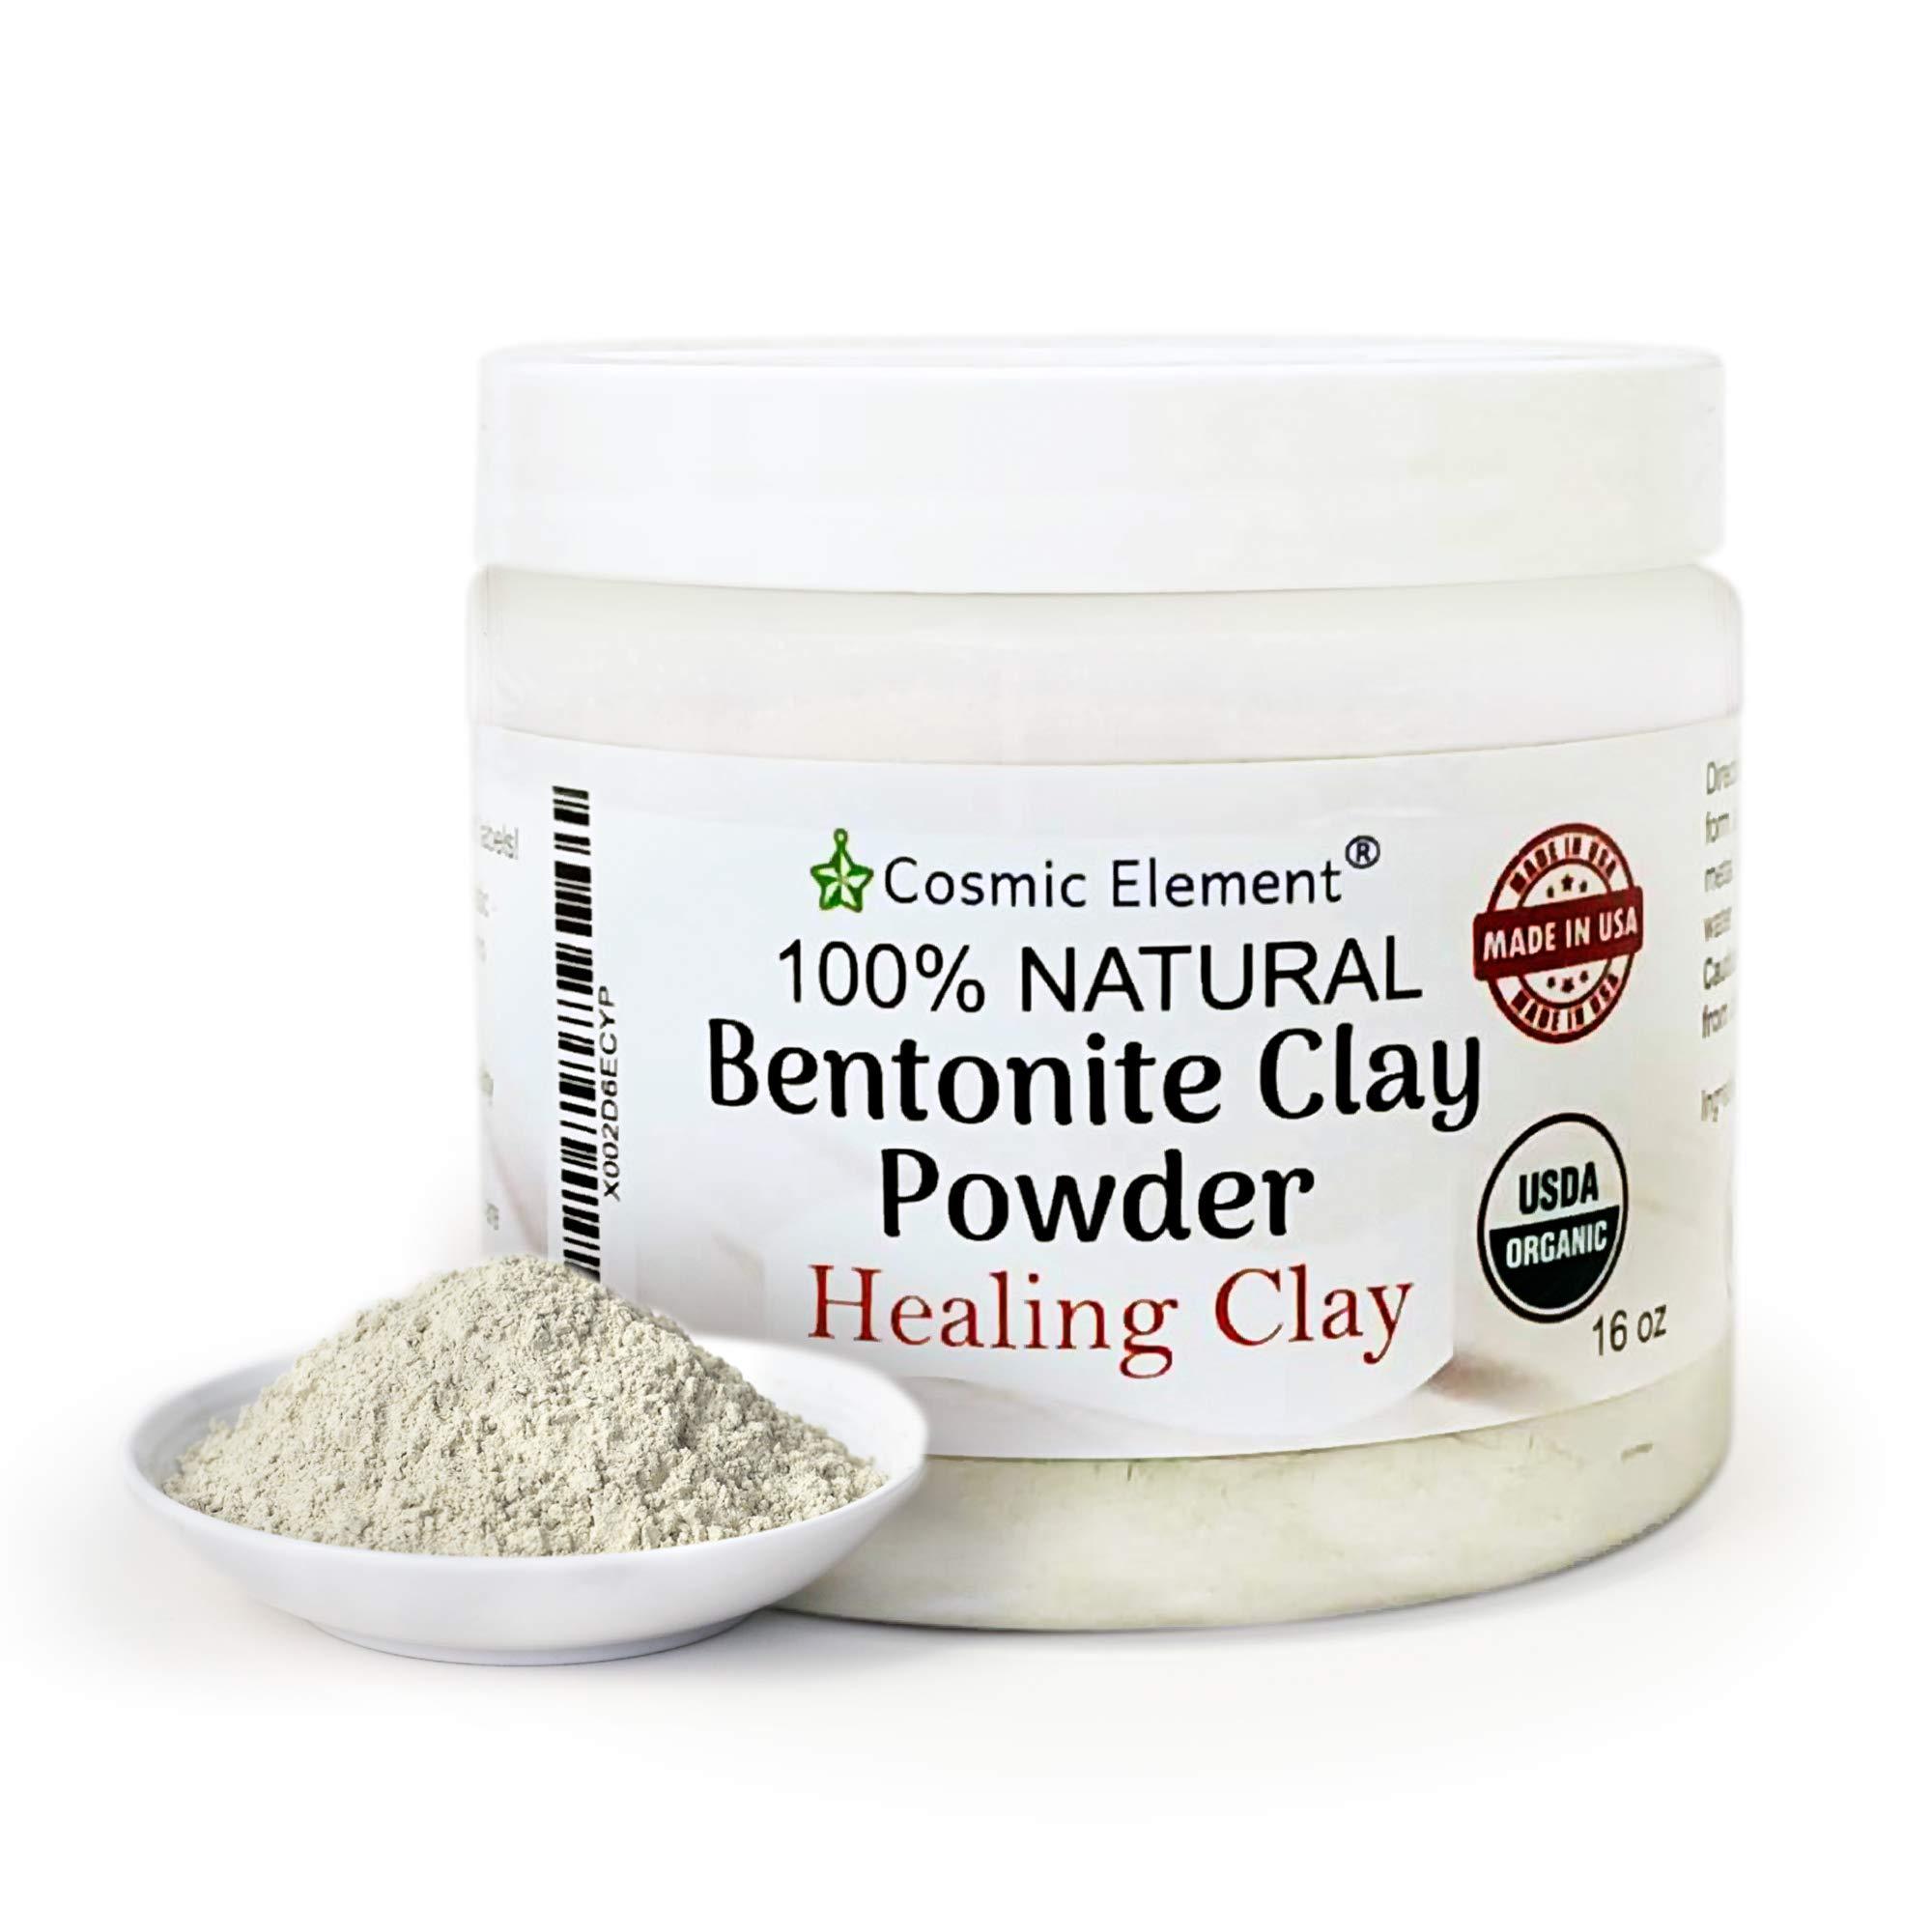 Cosmic Element Bentonite Clay Powder 100% Pure & Unrefined 1 lbs/16 Ounce Premium Calcium Bentonite Clay - Heavy Metal Detox and Cleanse